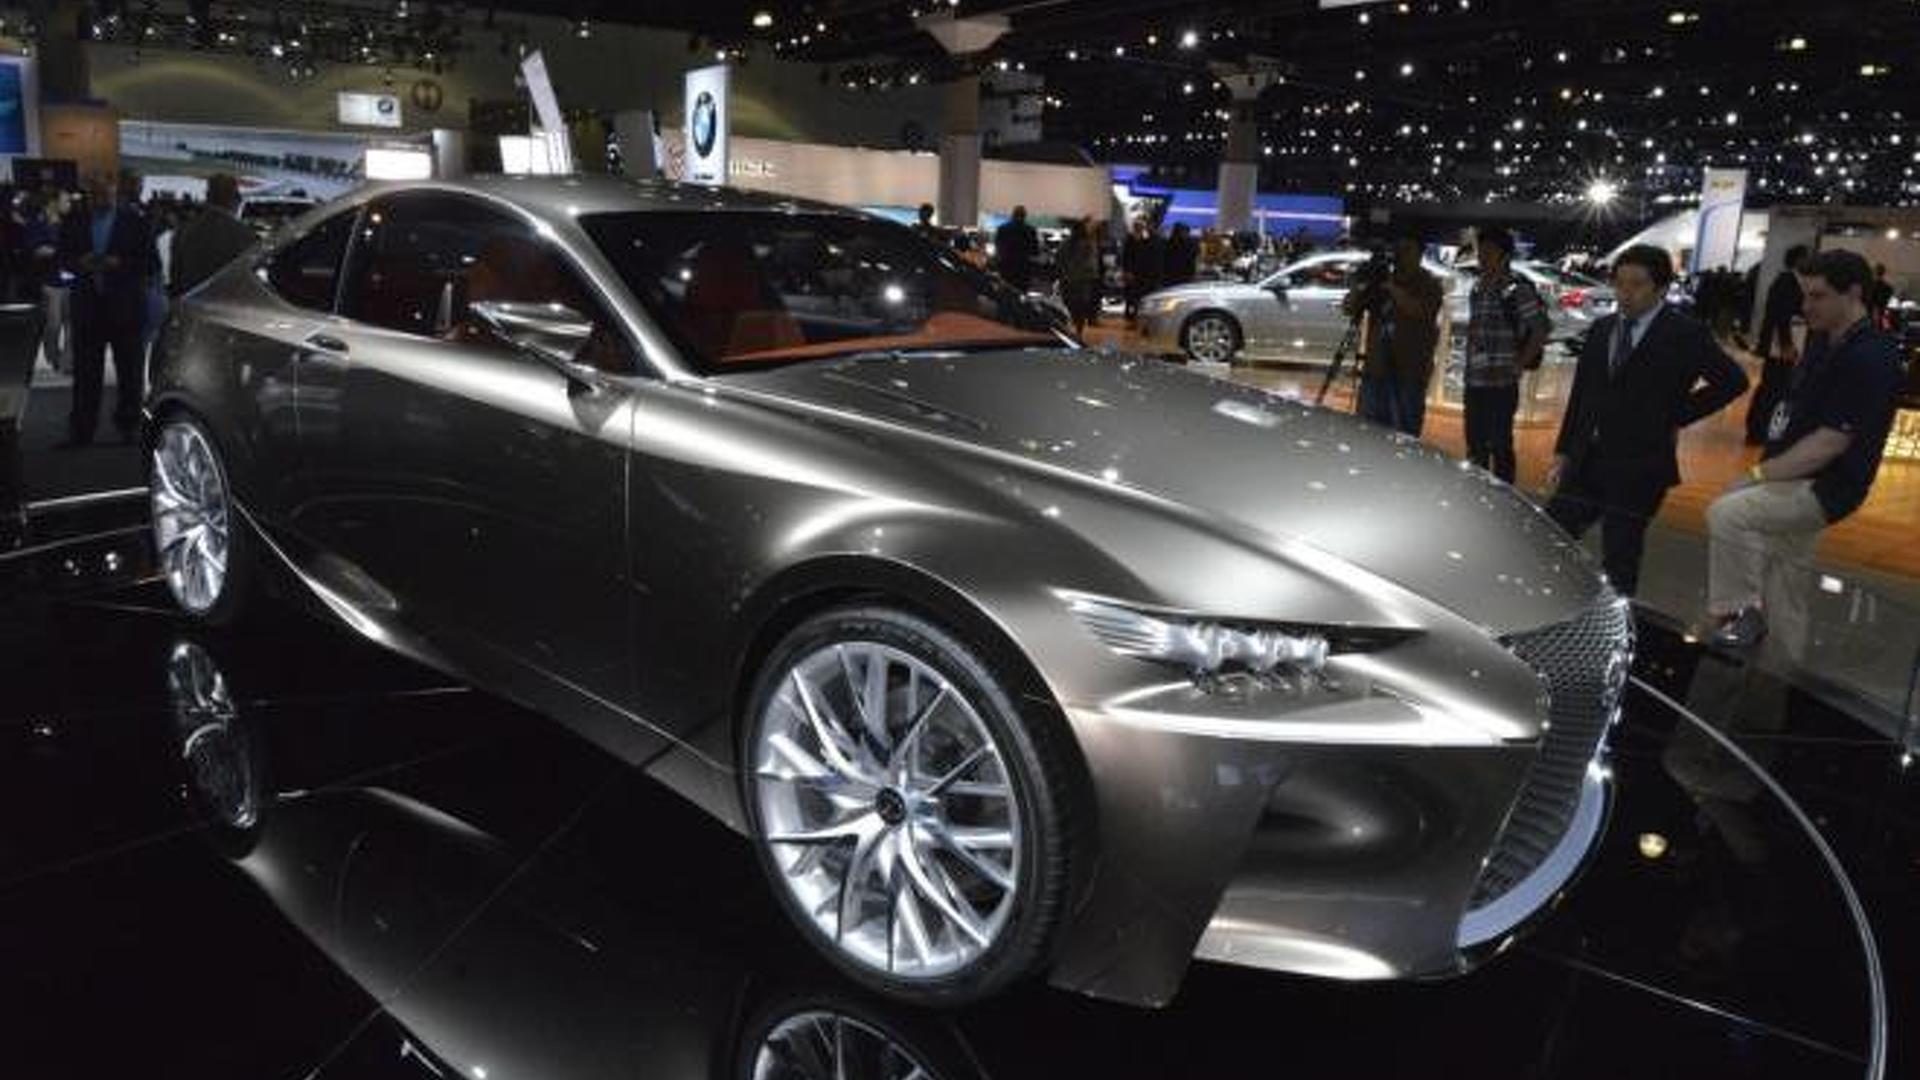 https://icdn-9.motor1.com/images/mgl/ZyENN/s1/2012-348659-lexus-lf-cc-concept-live-in-la-auto-show-29-11-20121.jpg